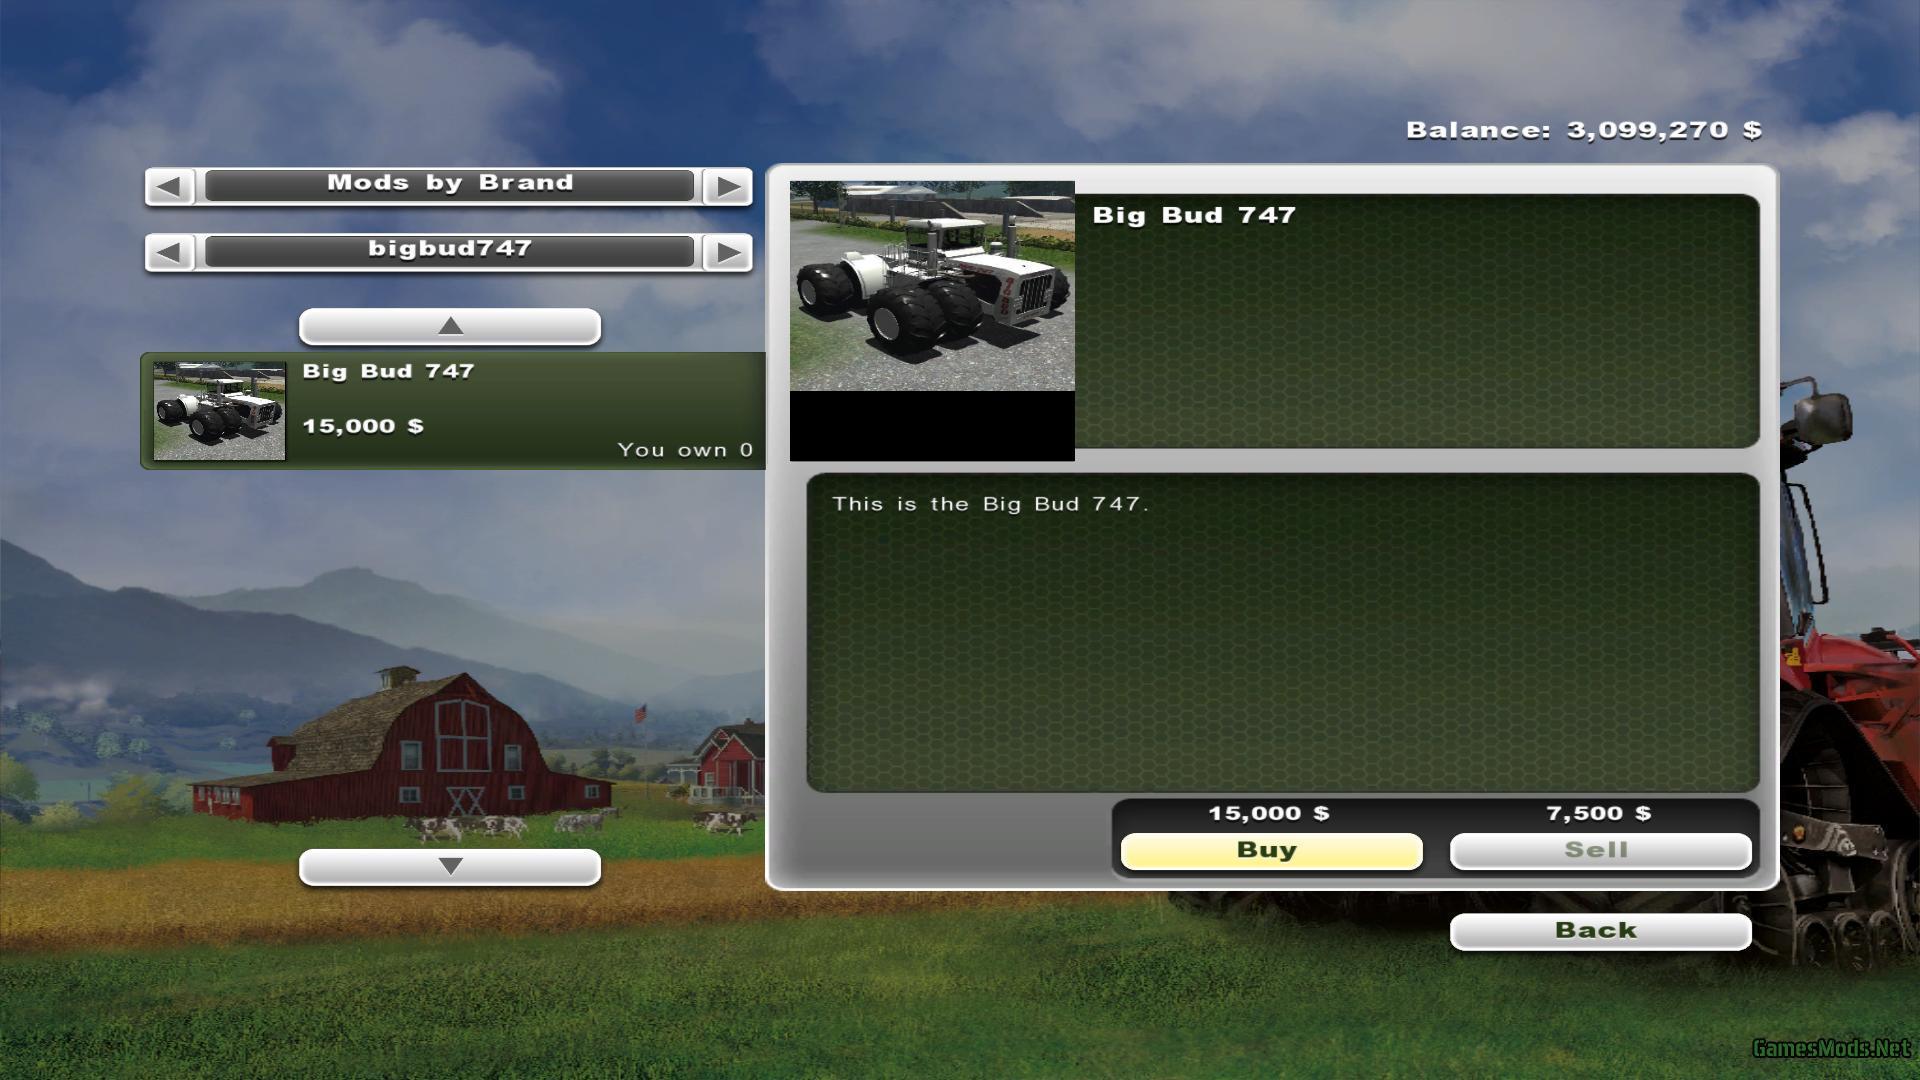 Big Bud 747 >> BIG BUD 16V 747 New wheels » GamesMods.net - FS19, FS17, ETS 2 mods